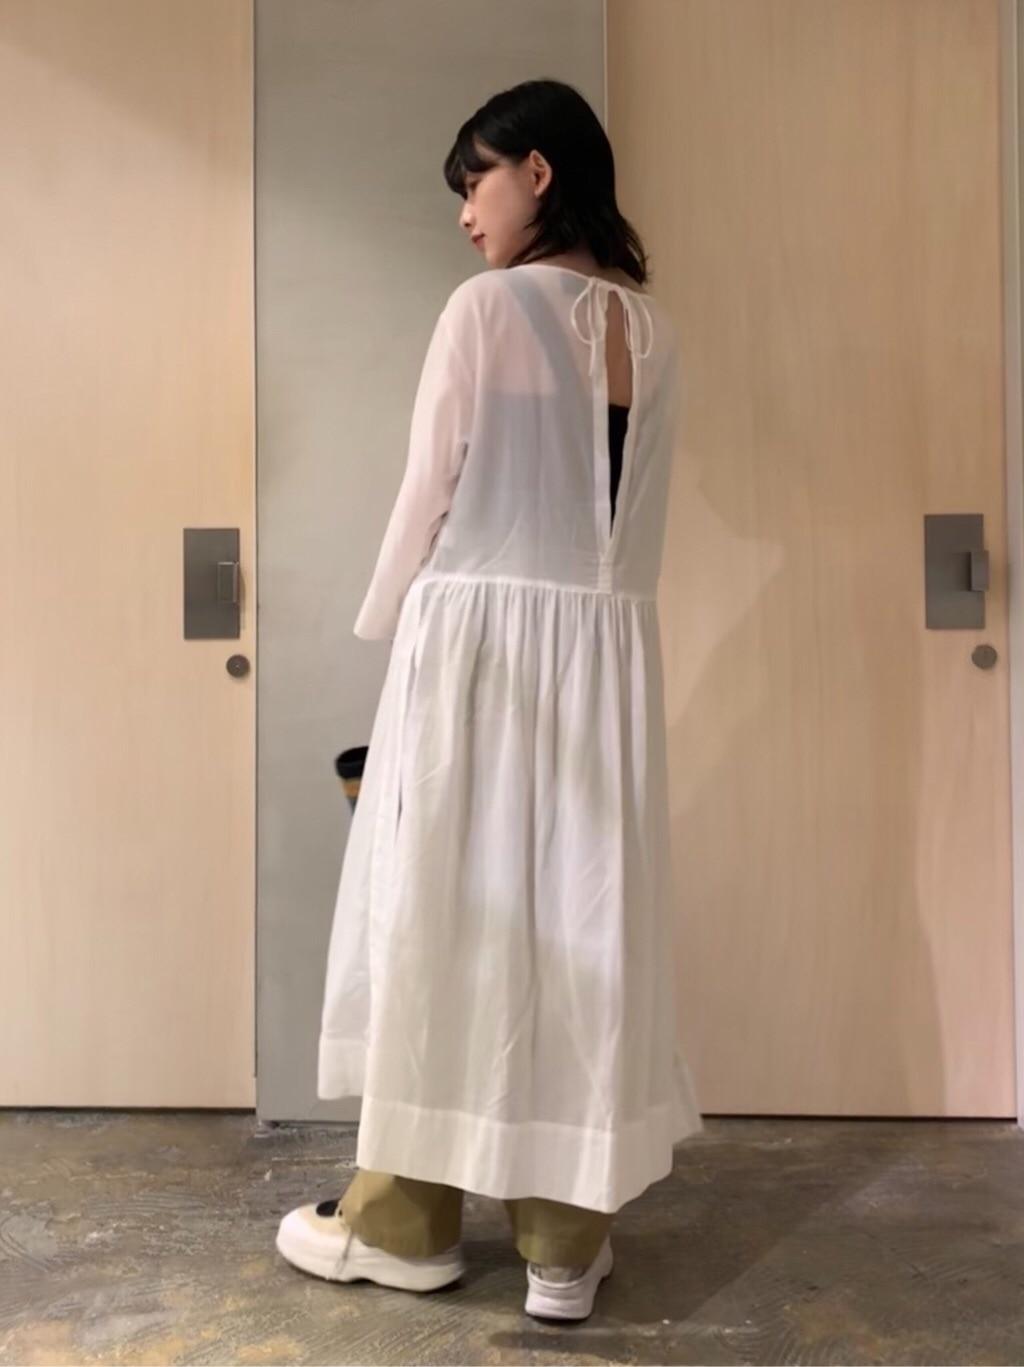 note et silence. ルミネ新宿 身長:159cm 2020.06.12